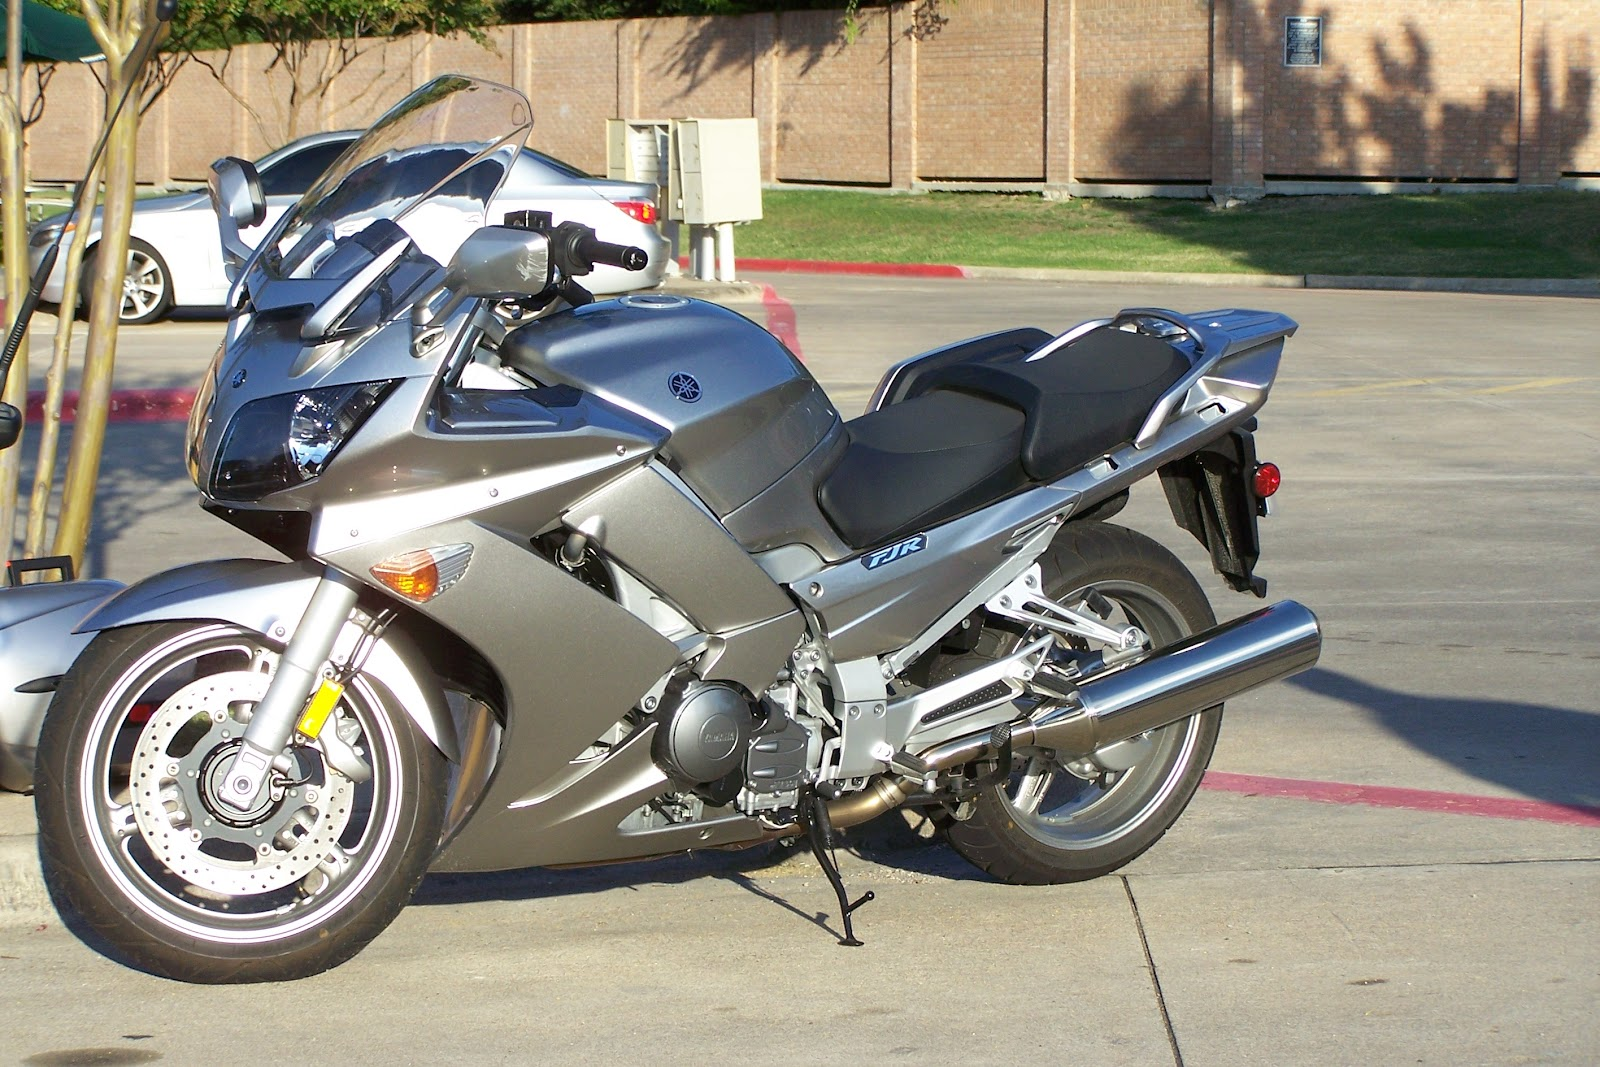 Yamaha FJR1300 Supersport-Touring